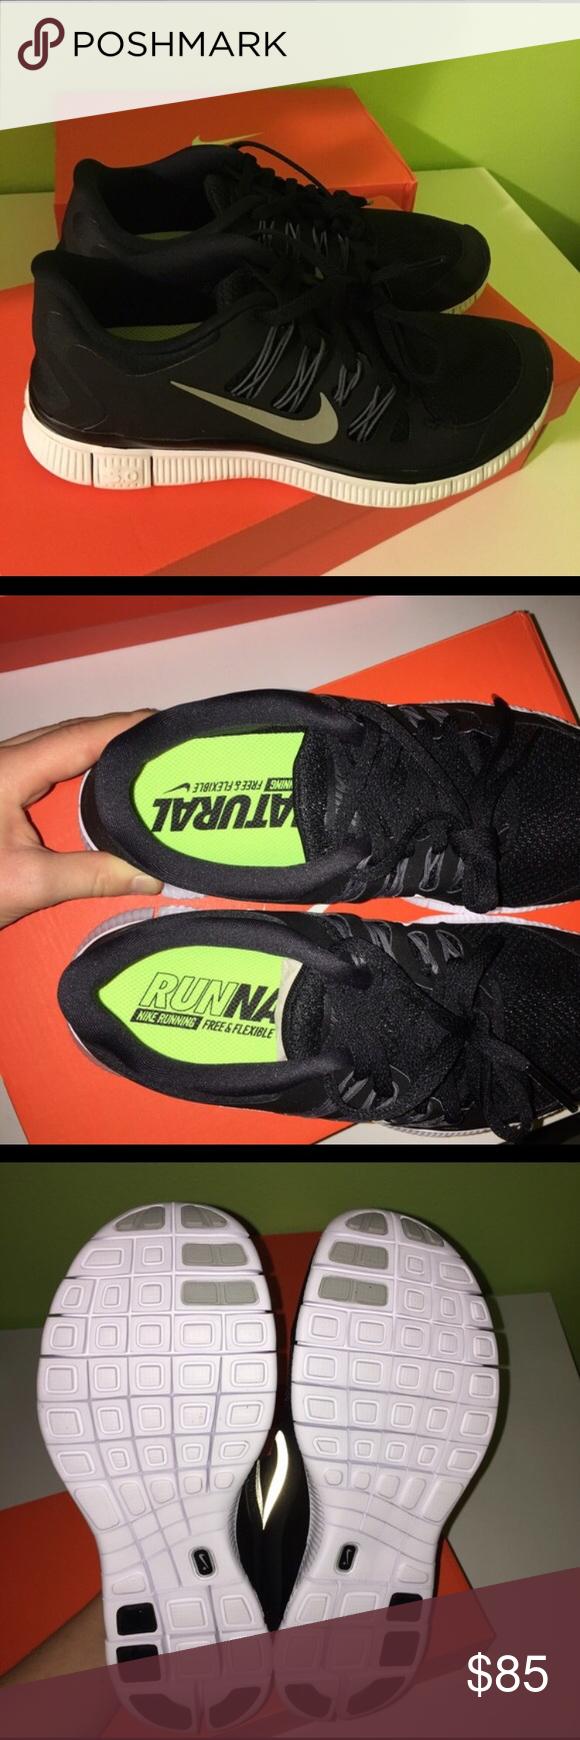 Negro Nike Free Run + In Size 6 Brand New In + Box WoHombres Nike Free f03e62